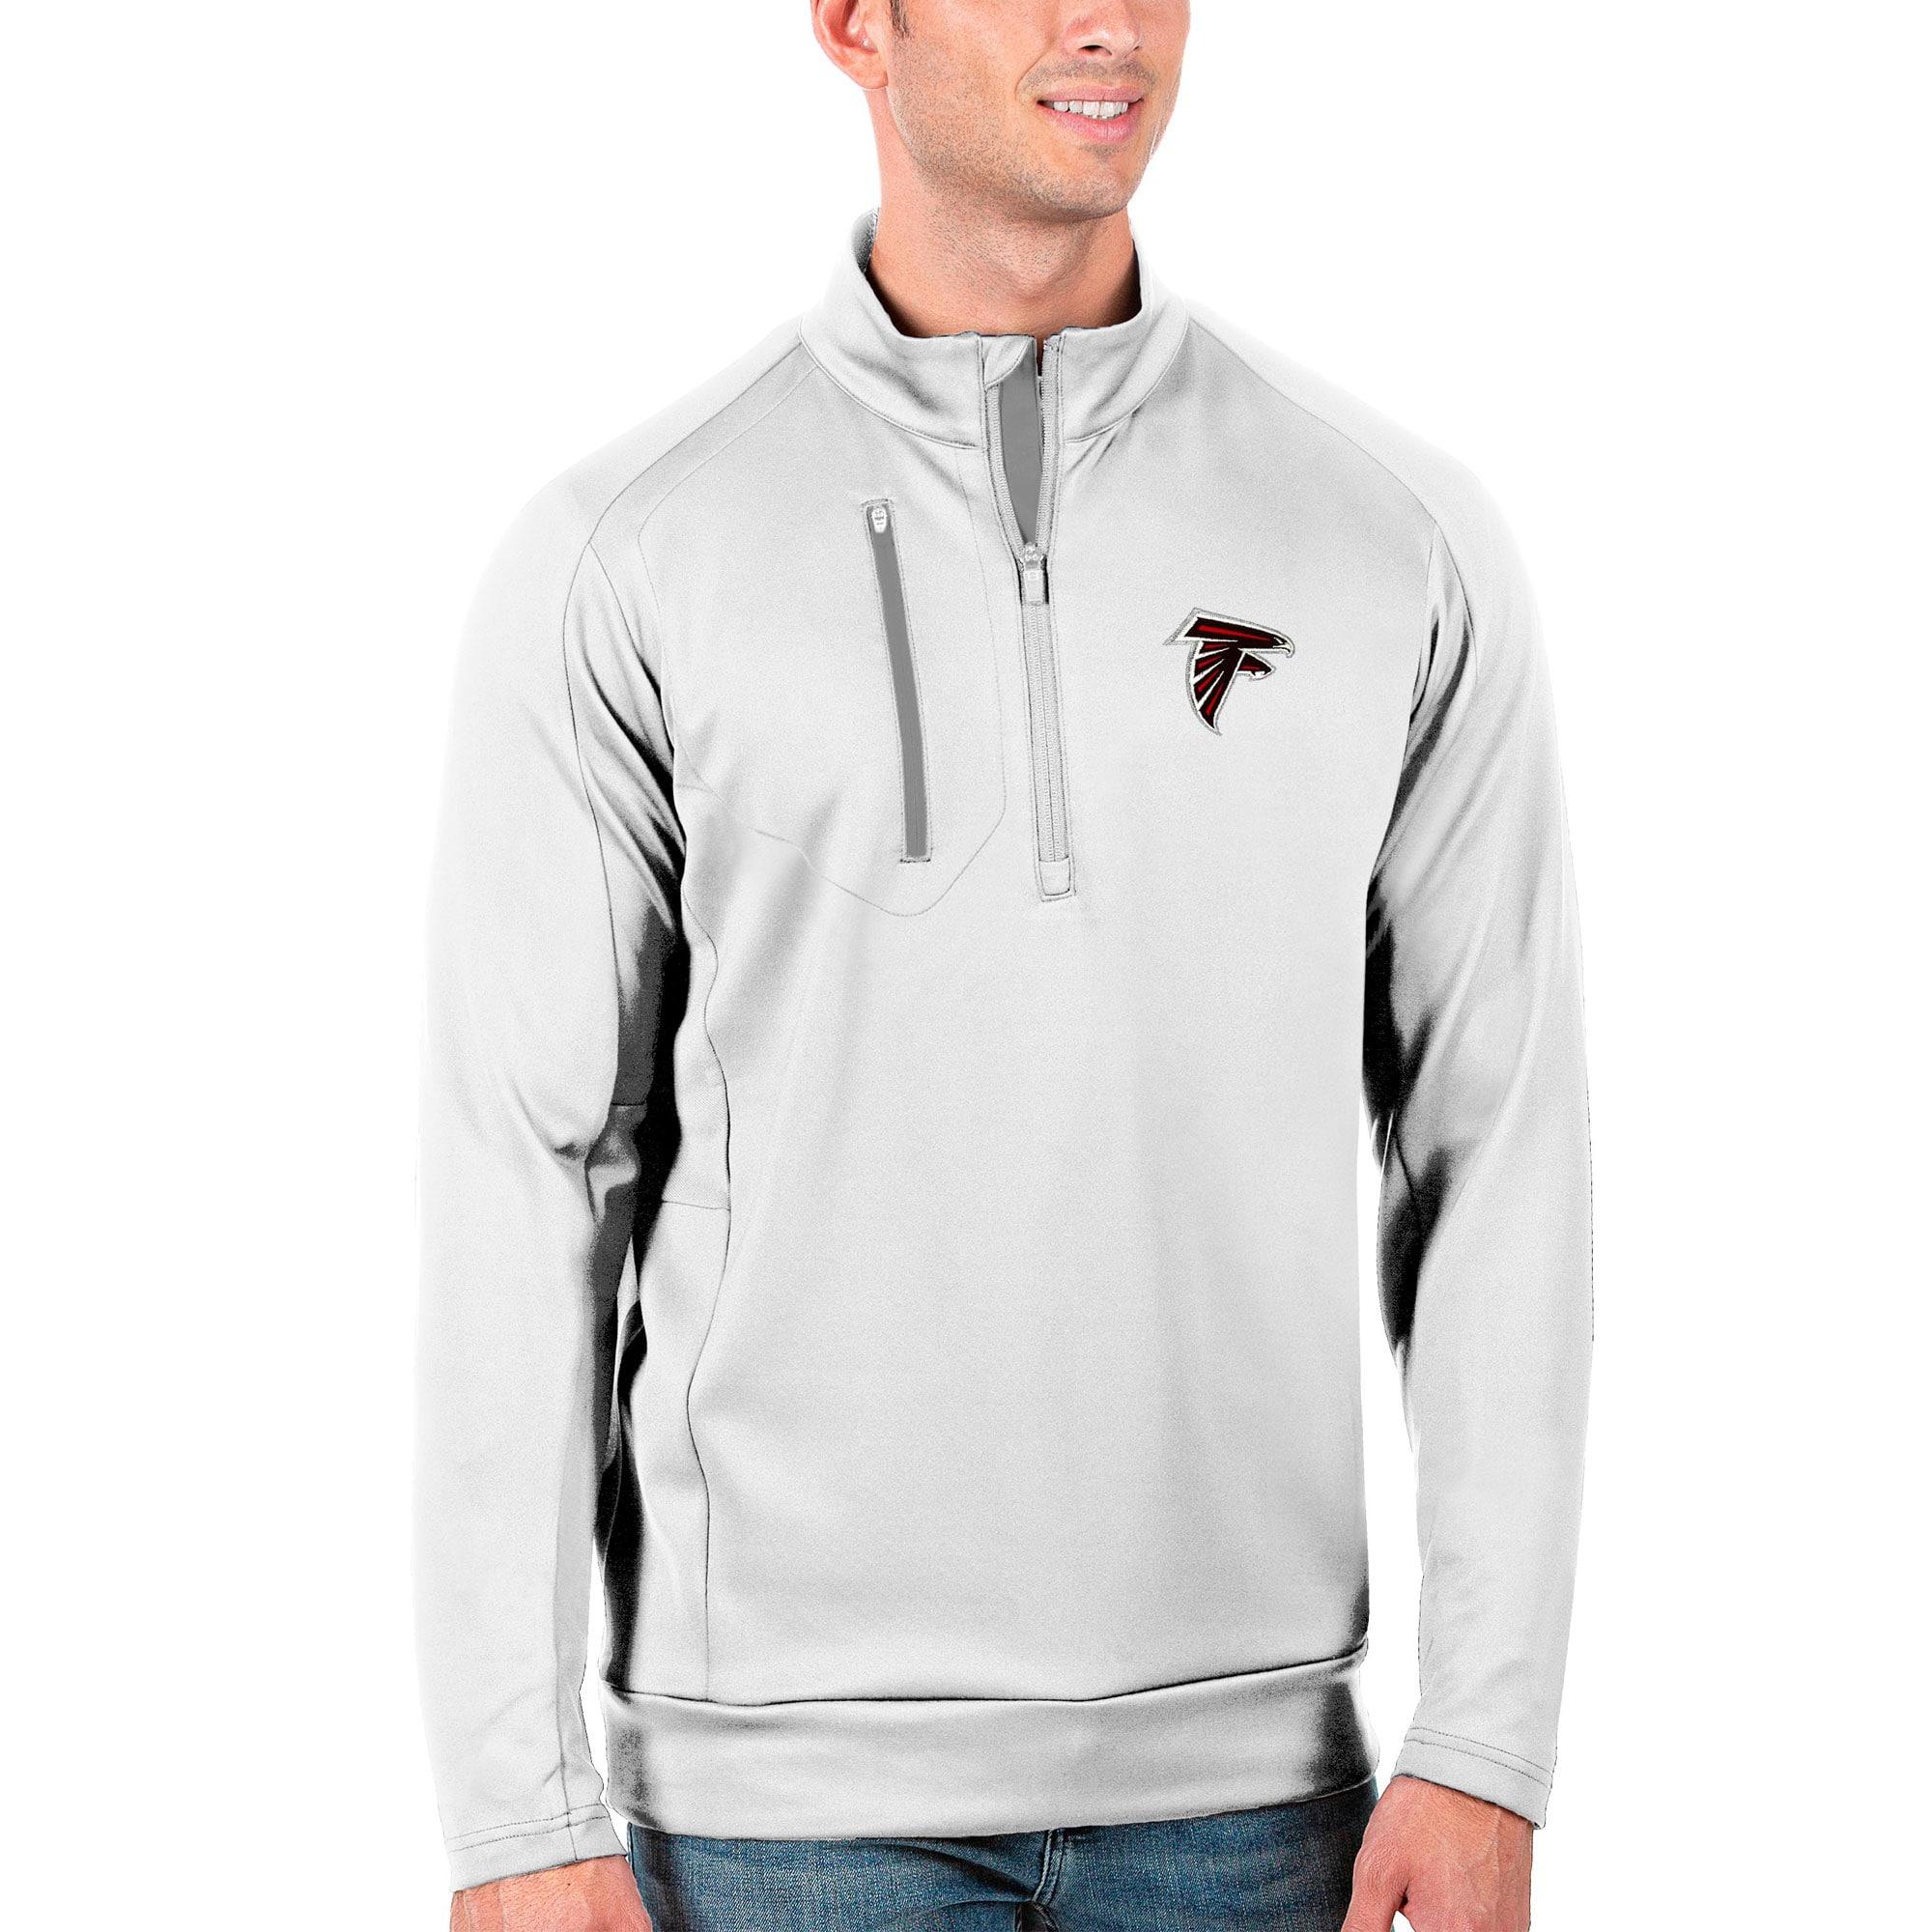 Atlanta Falcons Antigua Generation Quarter-Zip Pullover Jacket - White/Silver